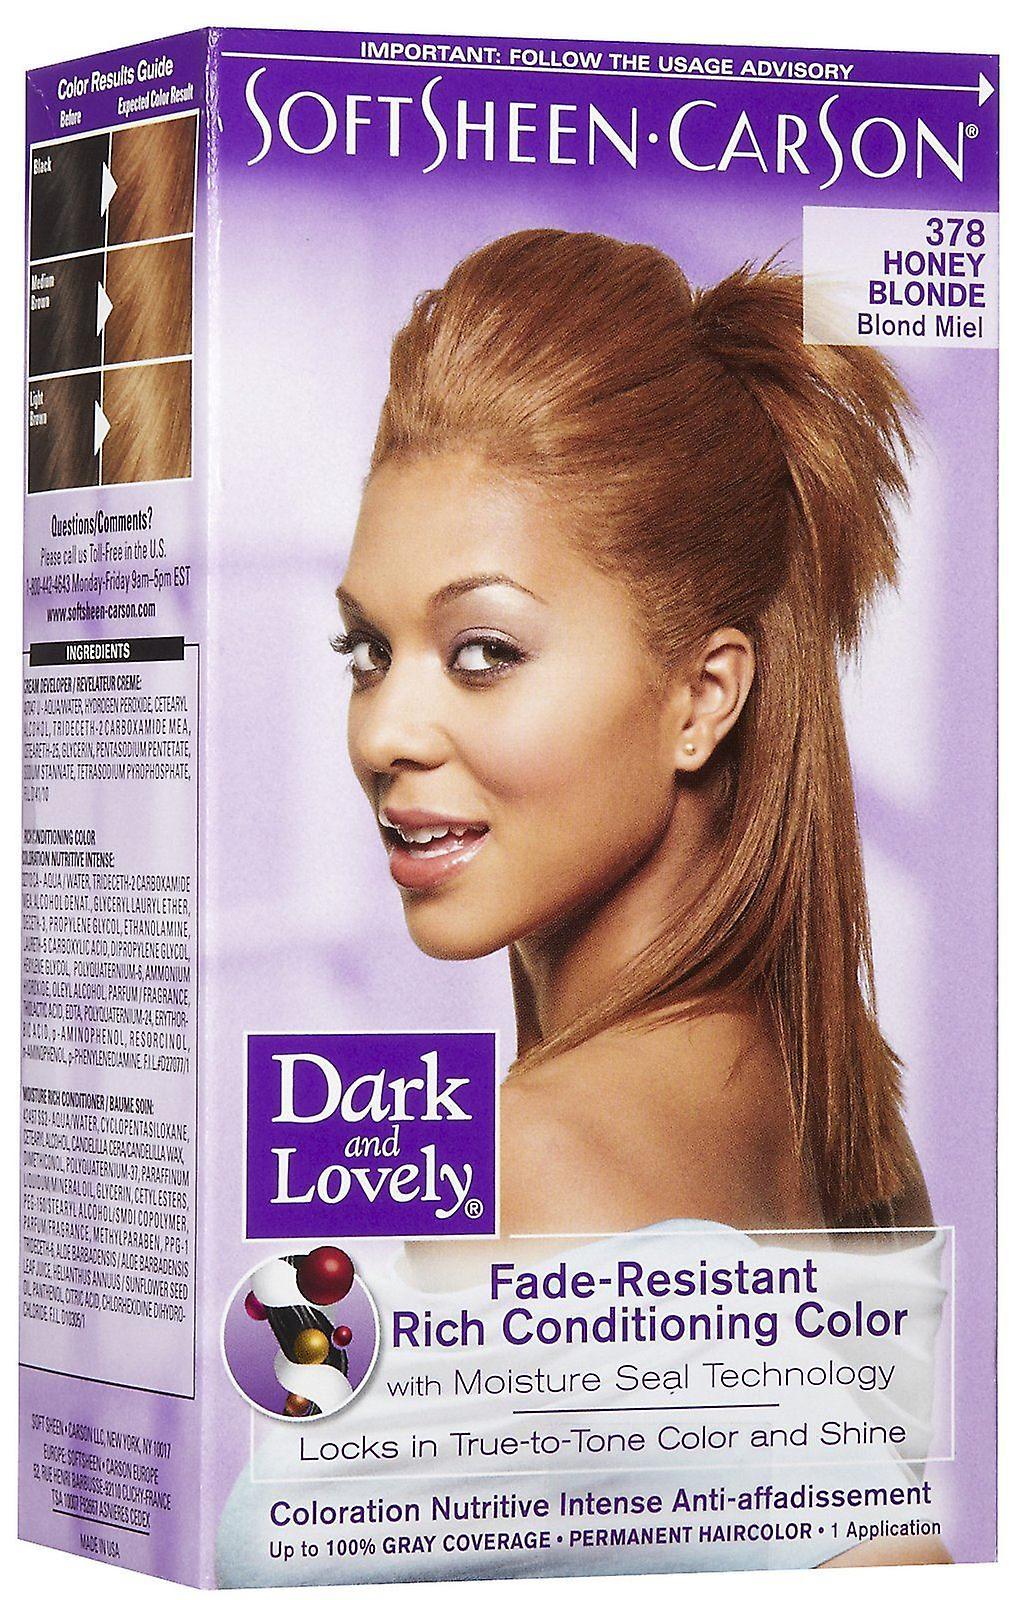 Dark & Lovely Conditioning Color Honey Blonde 378